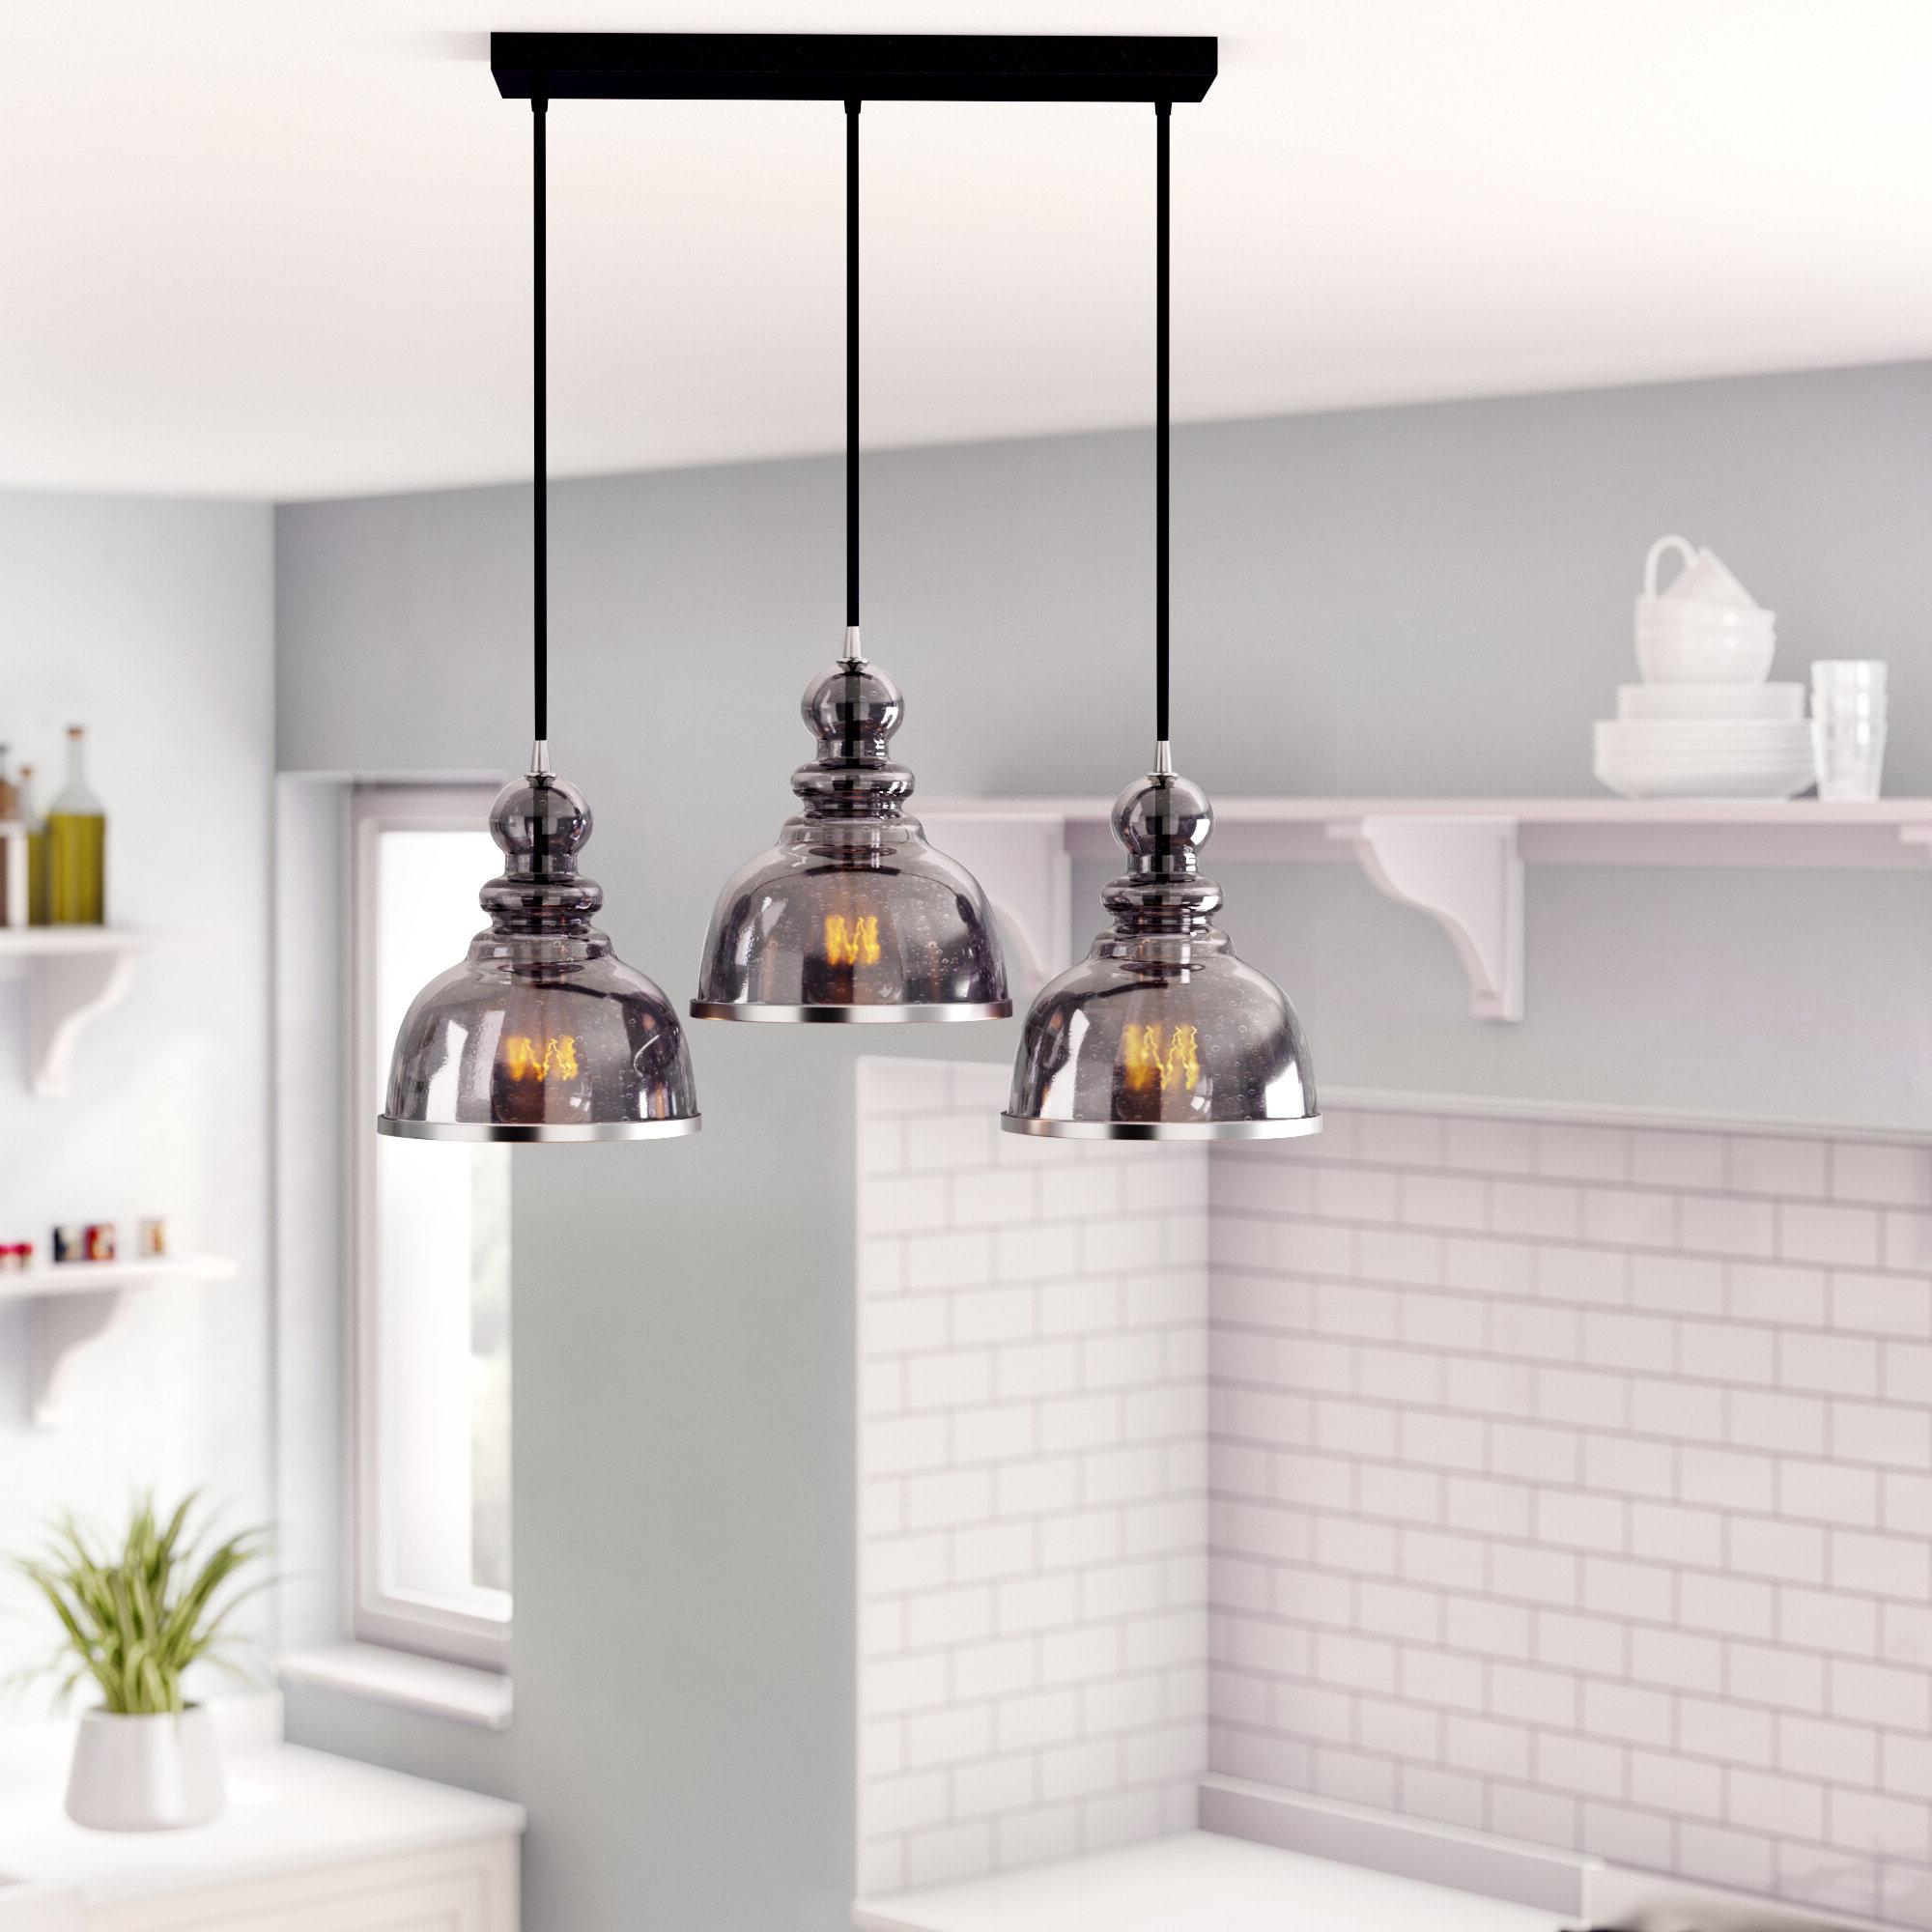 2019 Dunson 3 Light Kitchen Island Pendants Pertaining To Humphries 3Light Kitchen Island Pendant Lighting Kitchen (View 1 of 20)